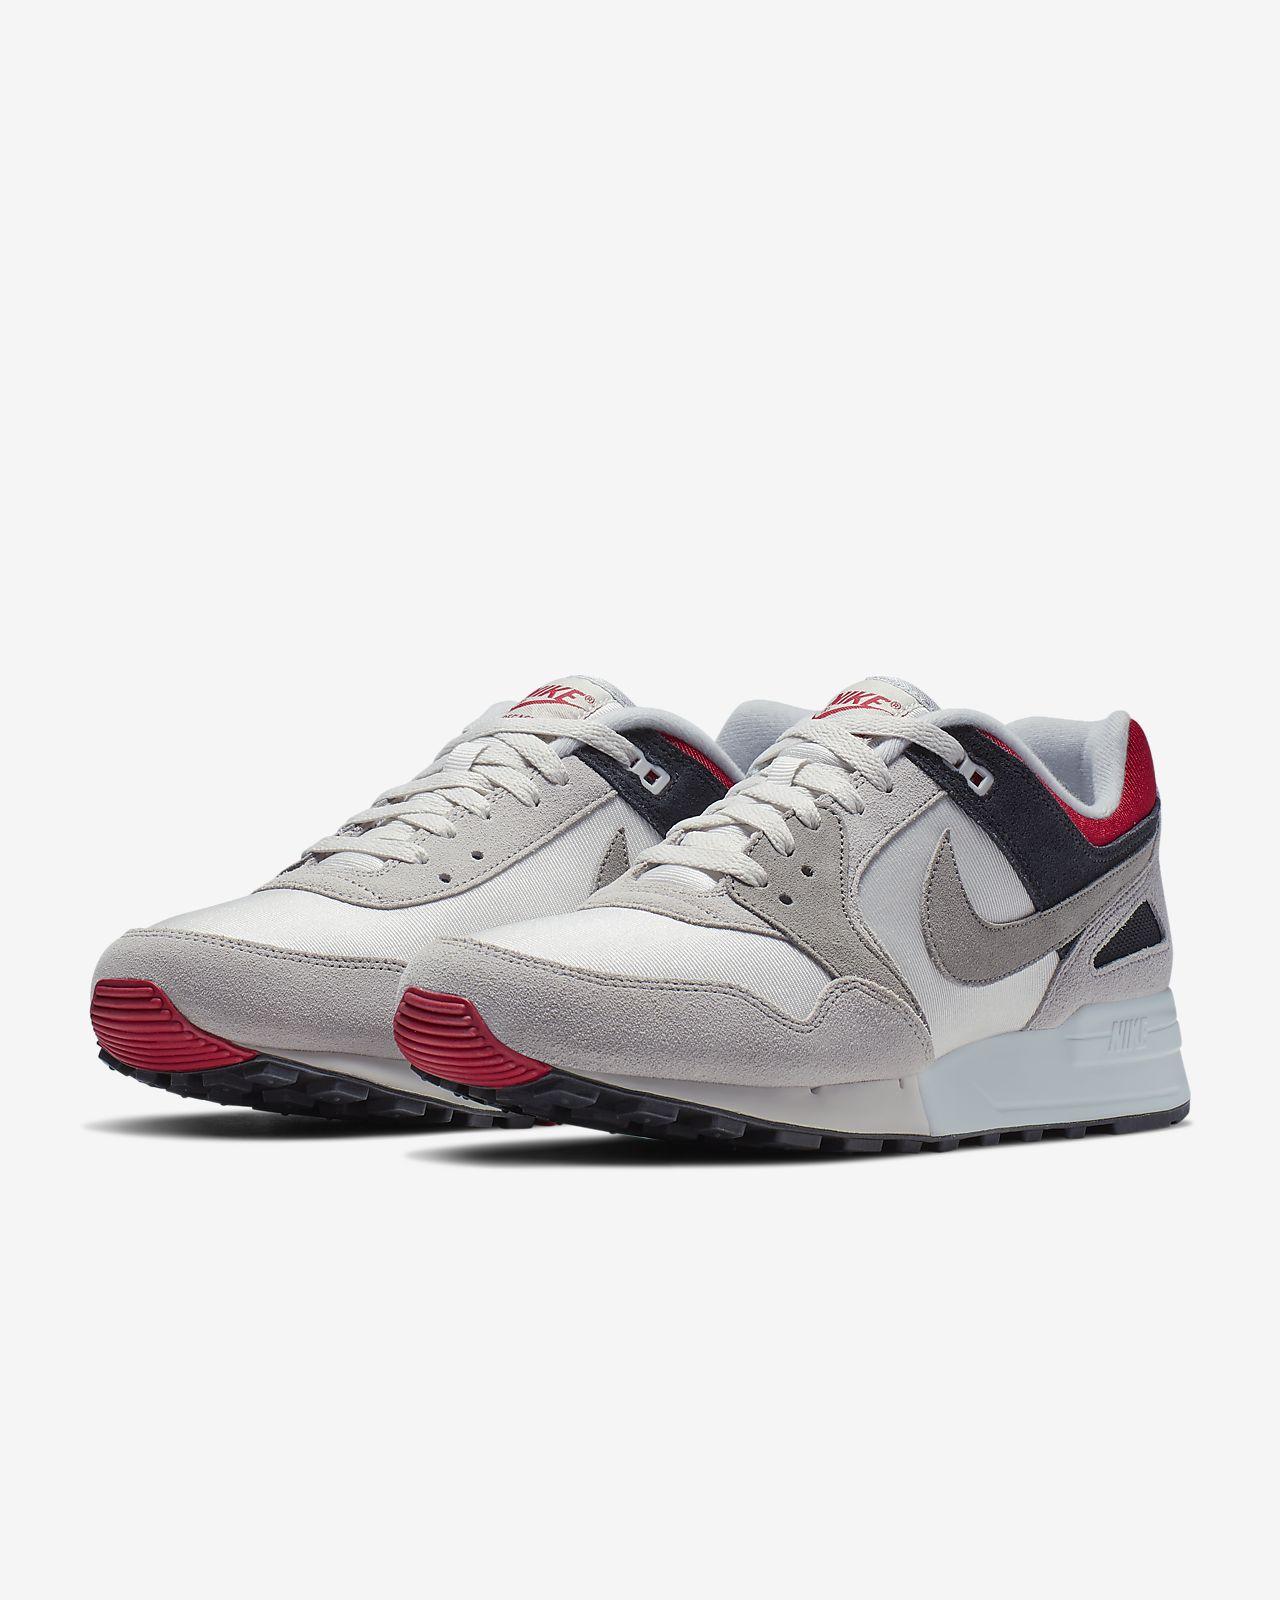 check out f626c 84fe9 ... Nike Air Pegasus  89 SE Men s Shoe